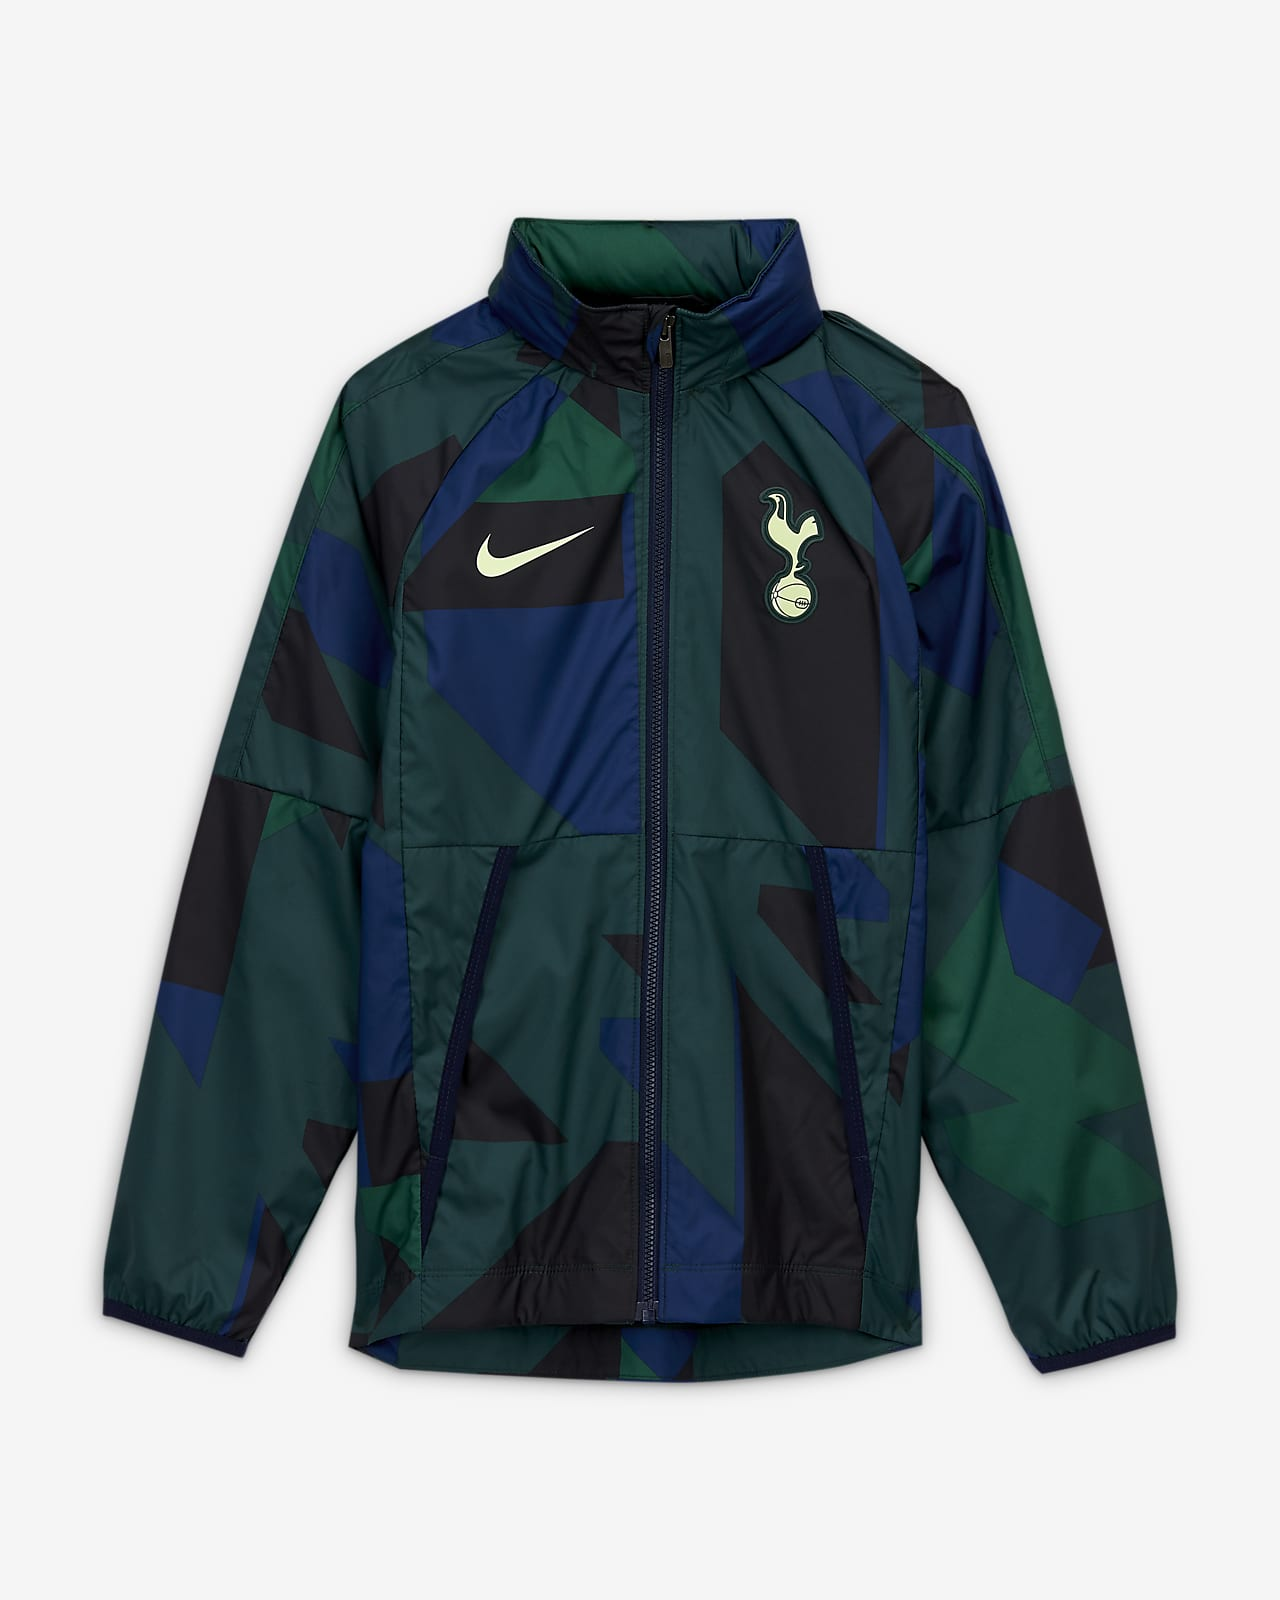 Tottenham Hotspur Chaqueta de fútbol - Niño/a